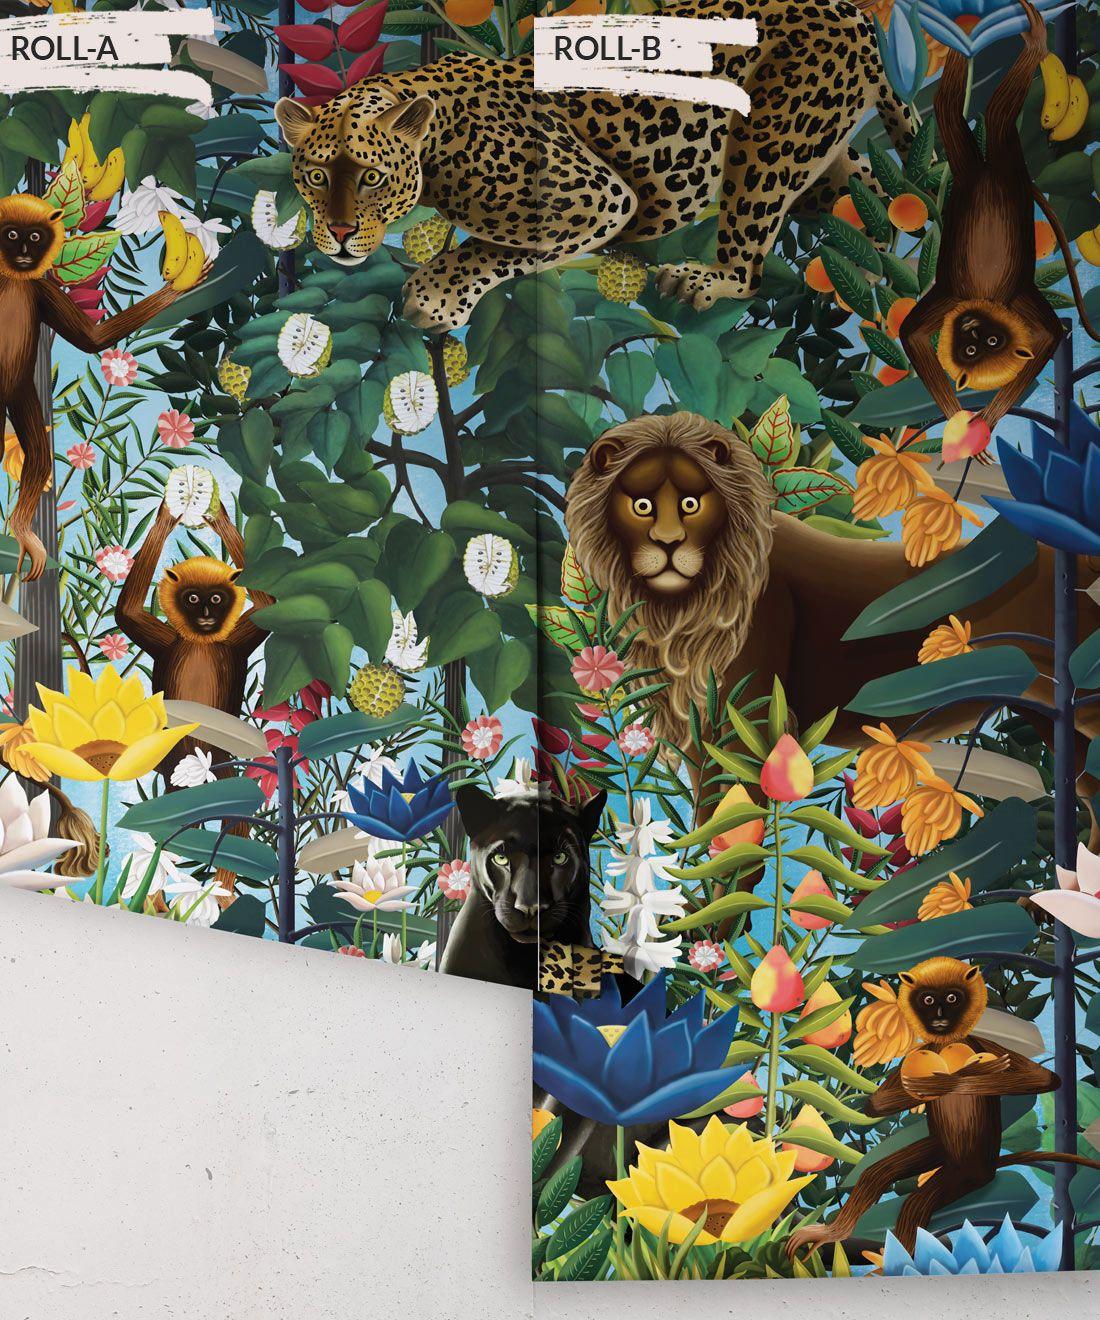 The Jungle Wallpaper • Animal Wallpaper • Botanical Wallpaper • Sky Wallpaper • Rolls